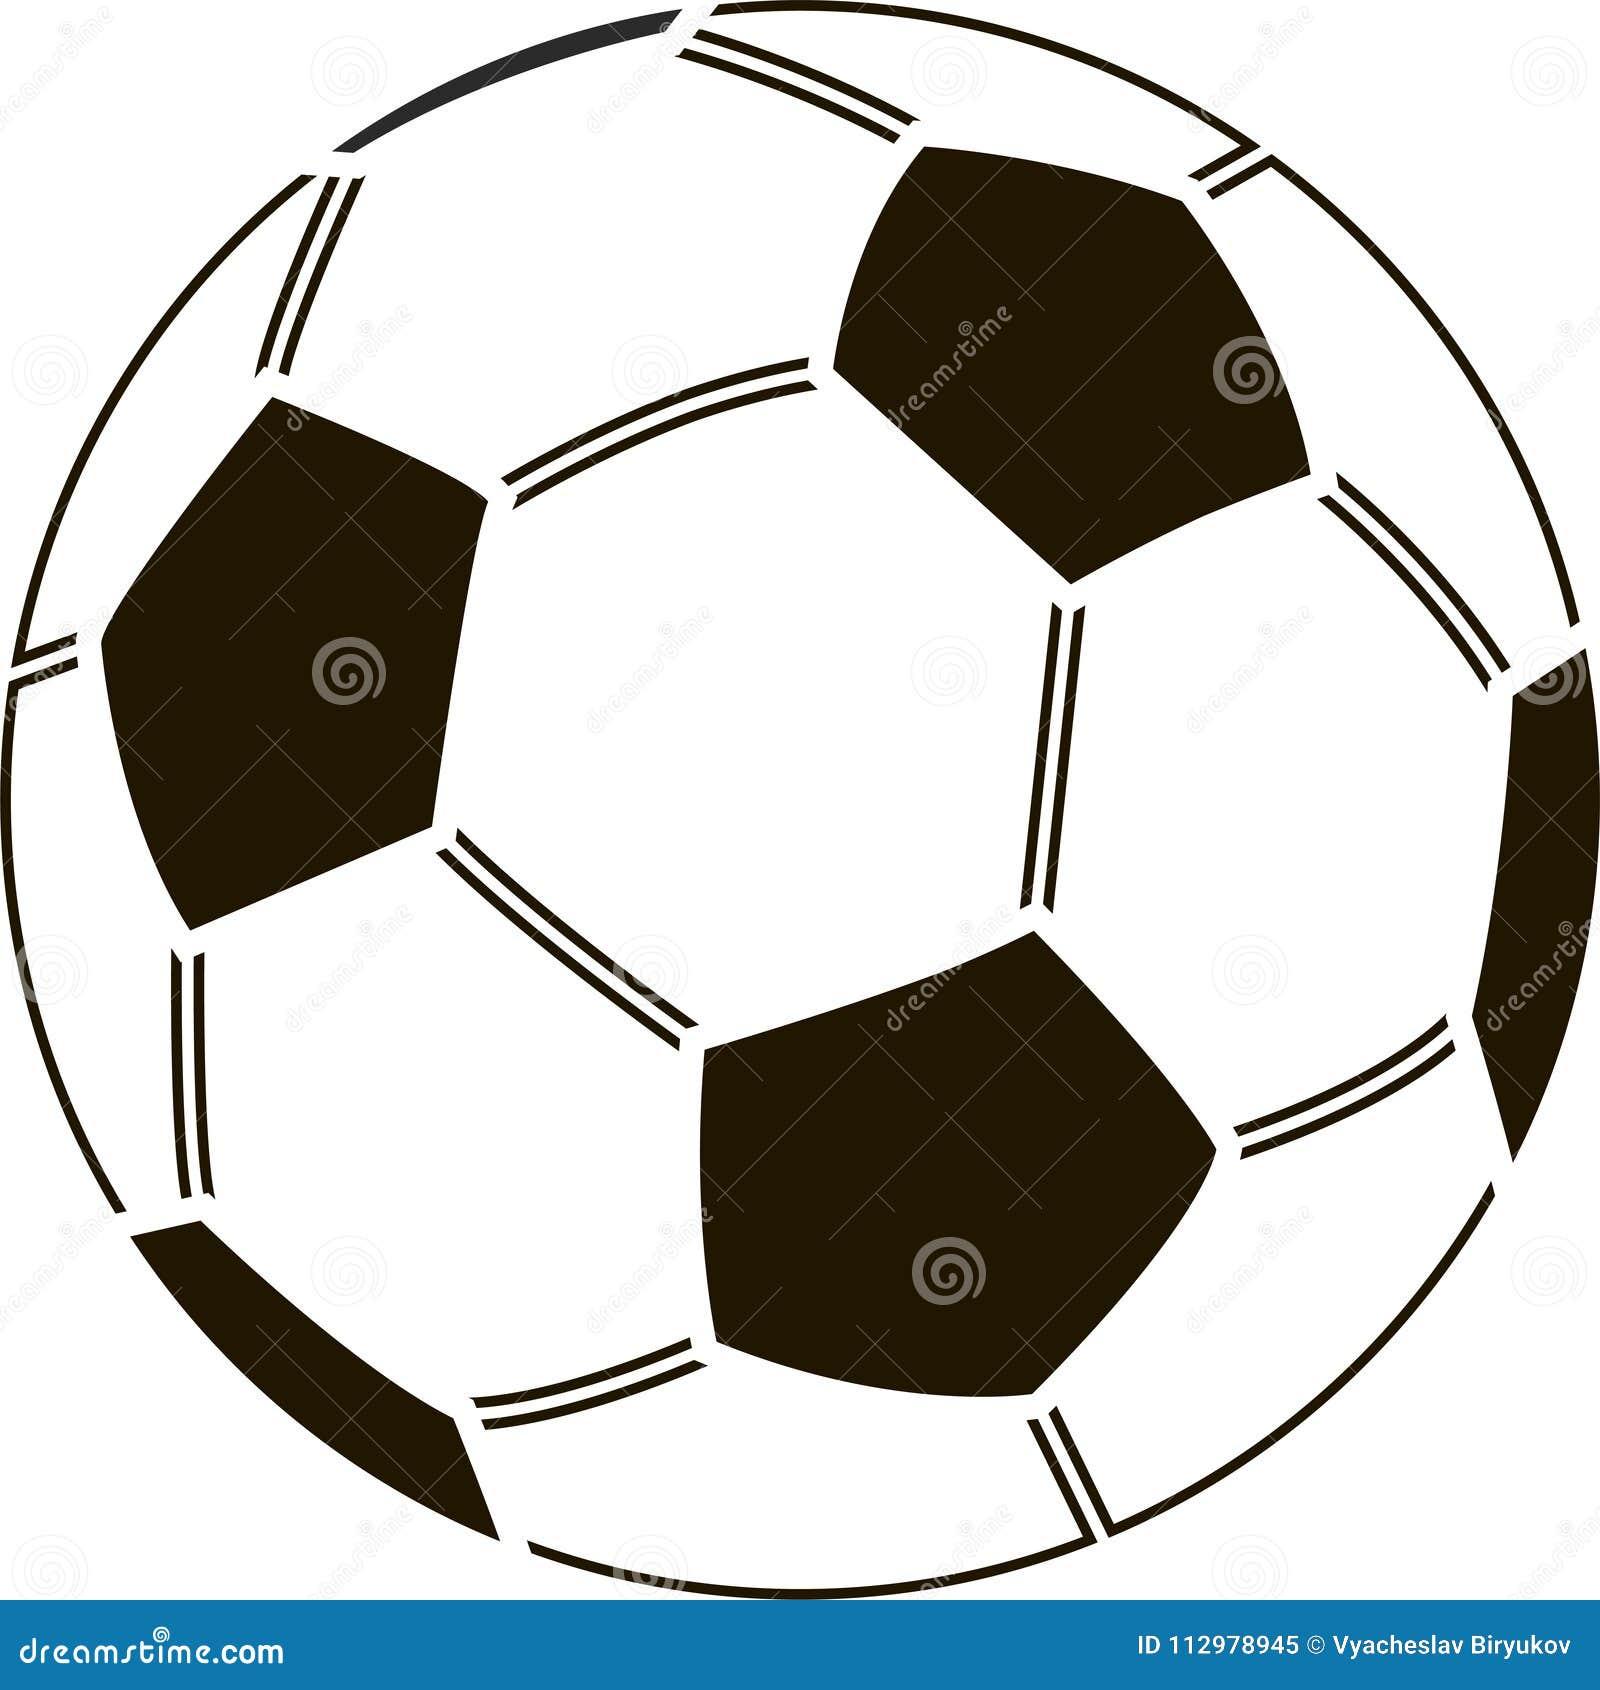 Stencil of soccer ball 2018